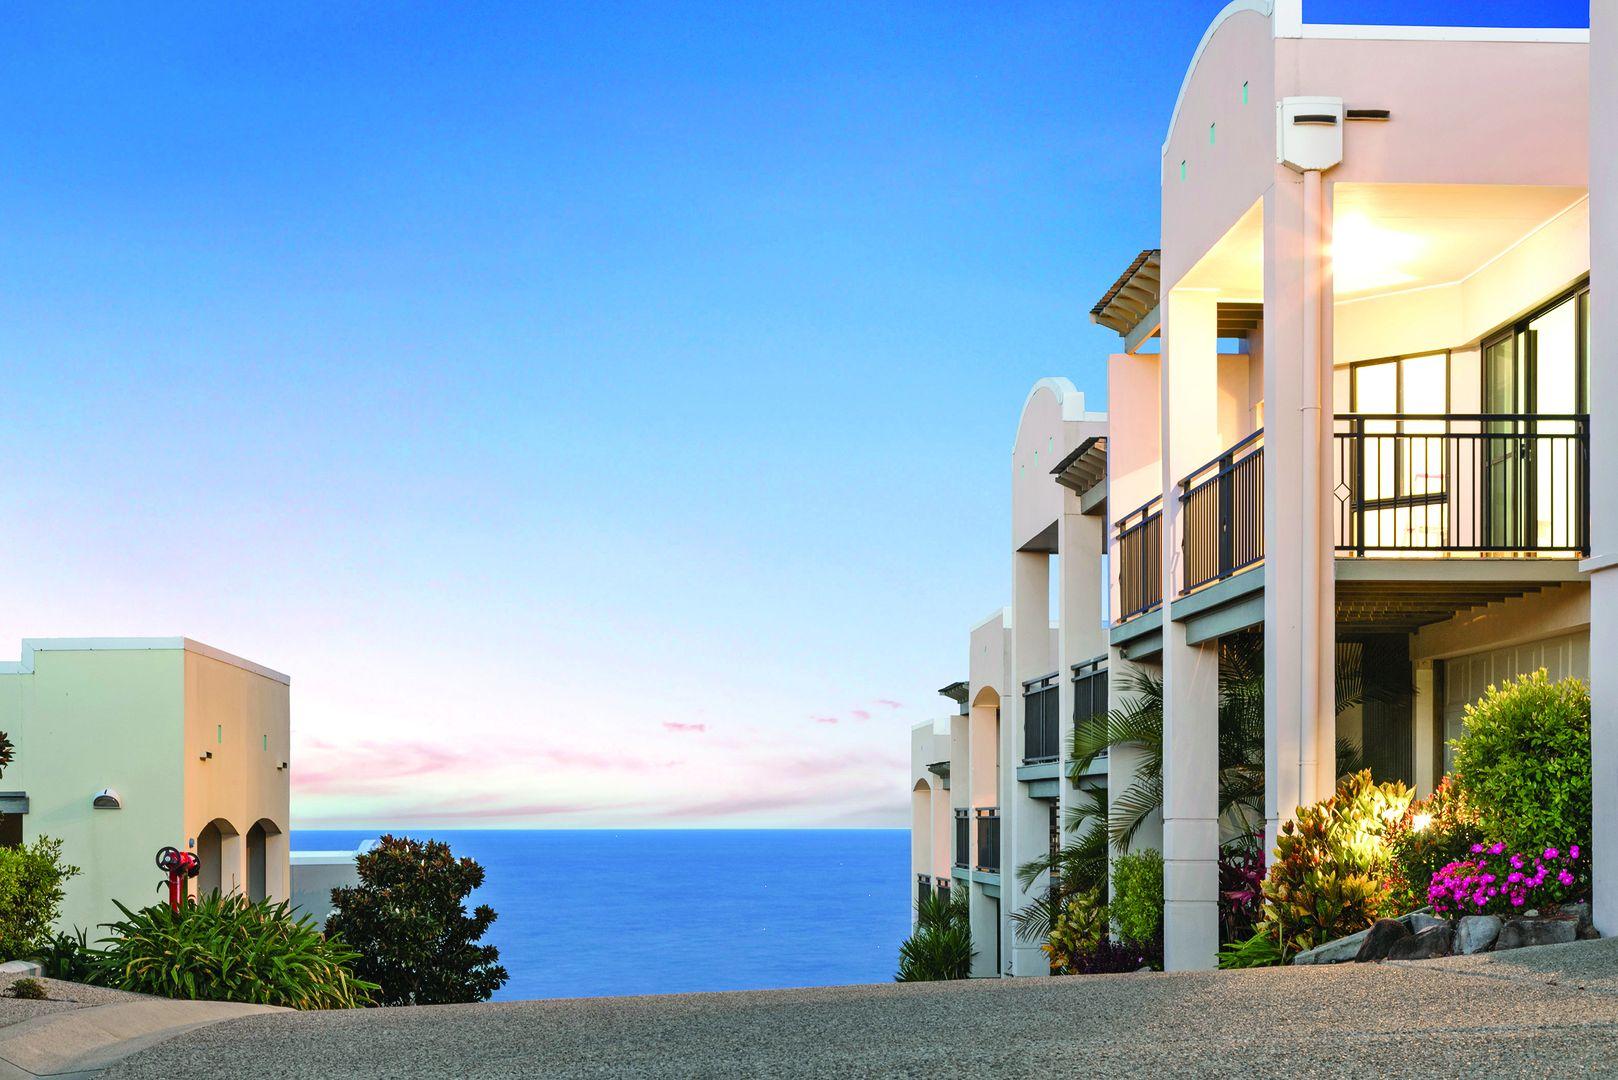 5/1 Bay Terrace, Coolum Beach QLD 4573, Image 1